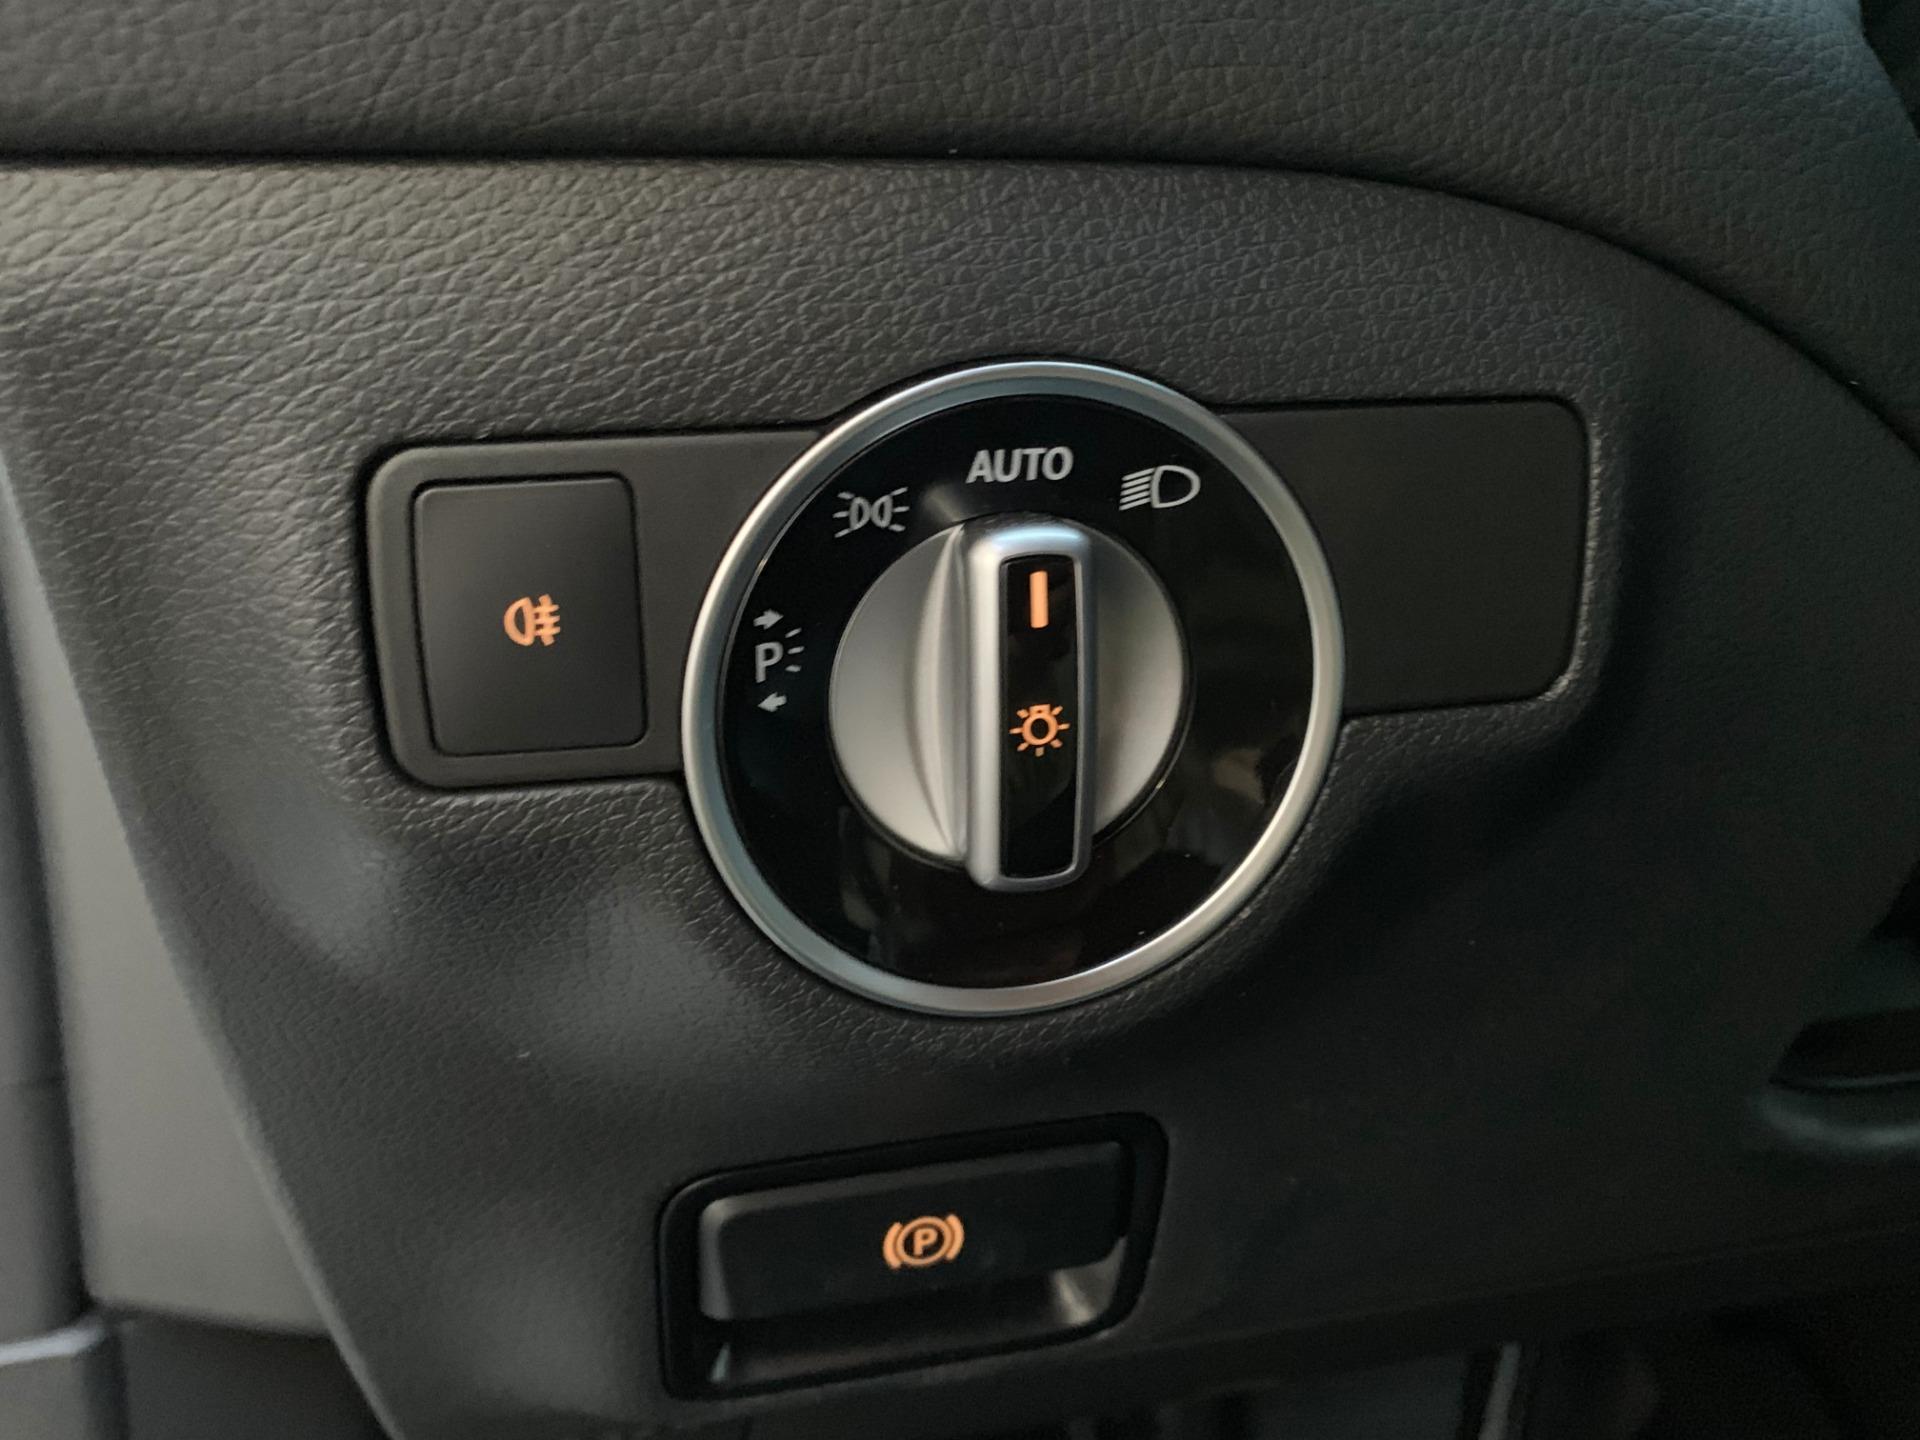 Used-2018-Mercedes-Benz-CLA-CLA-250-4MATIC